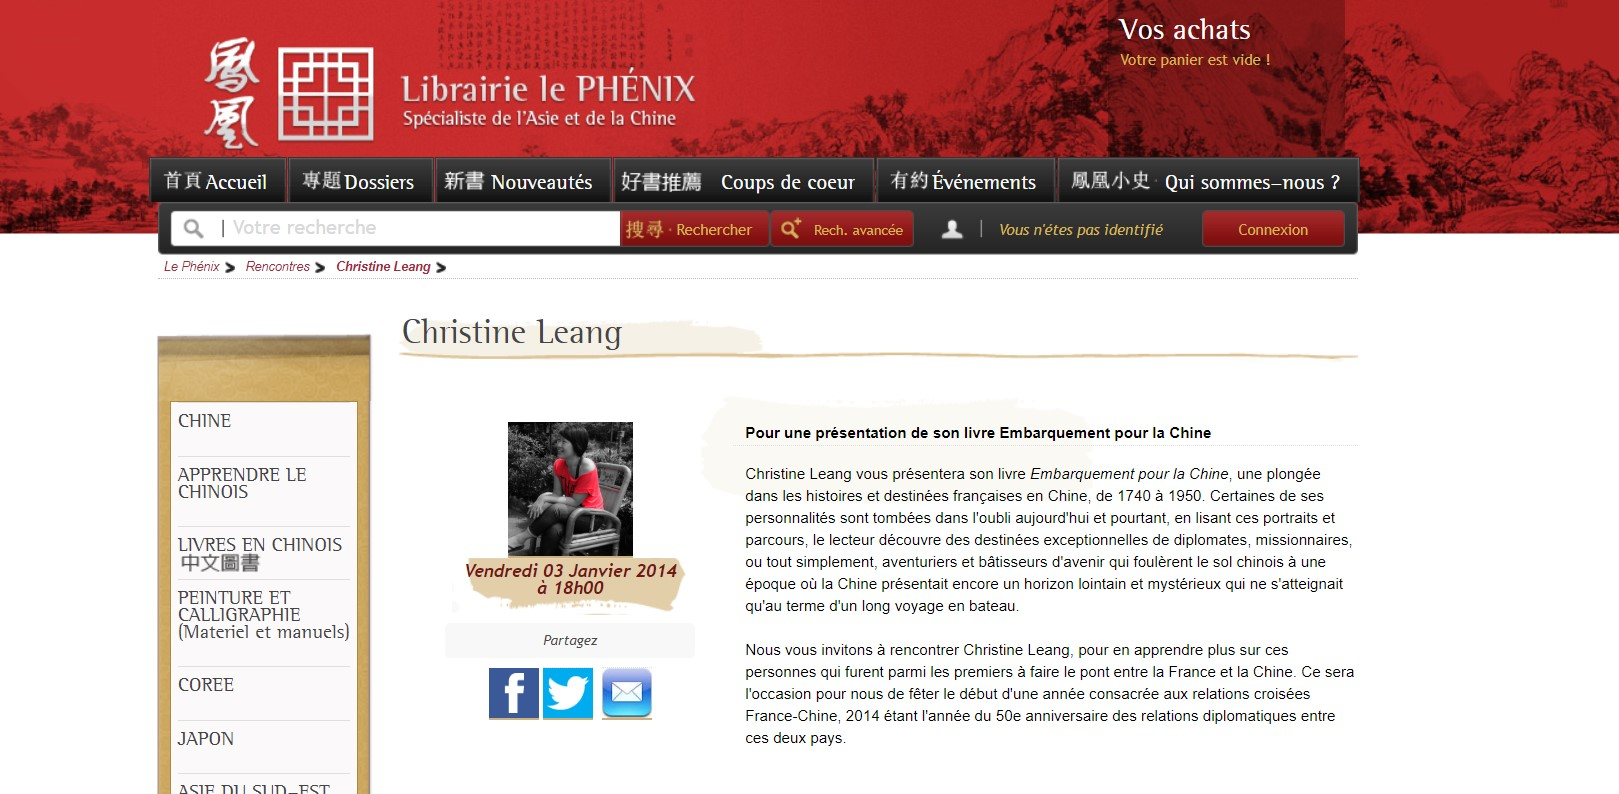 Librairie Le Phénix, janvier 2014